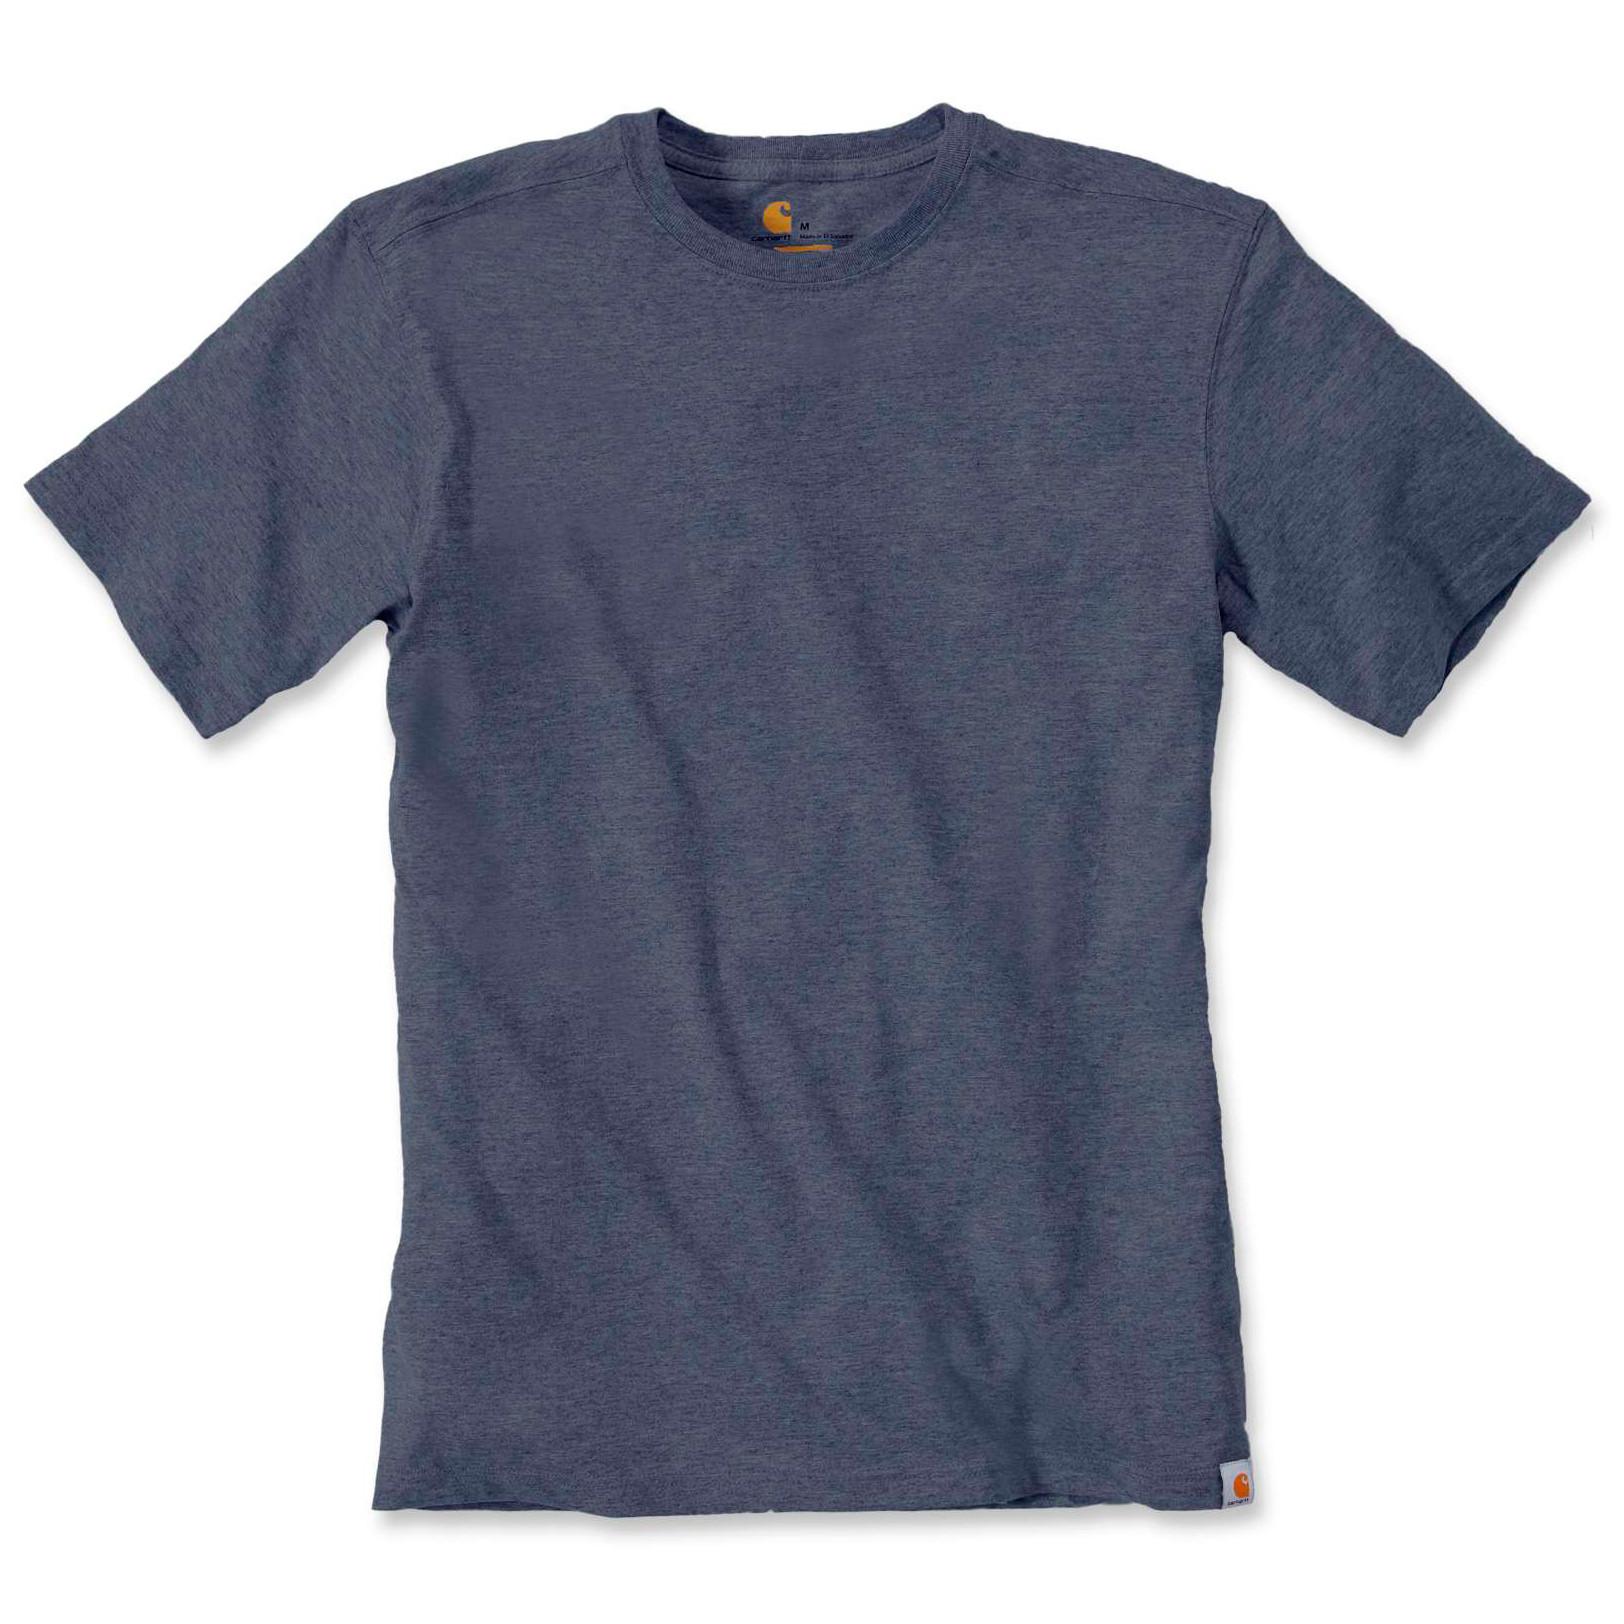 Футболка Carhartt Maddock T-Shirt S/S - 101124 (Indigo Heather, S)